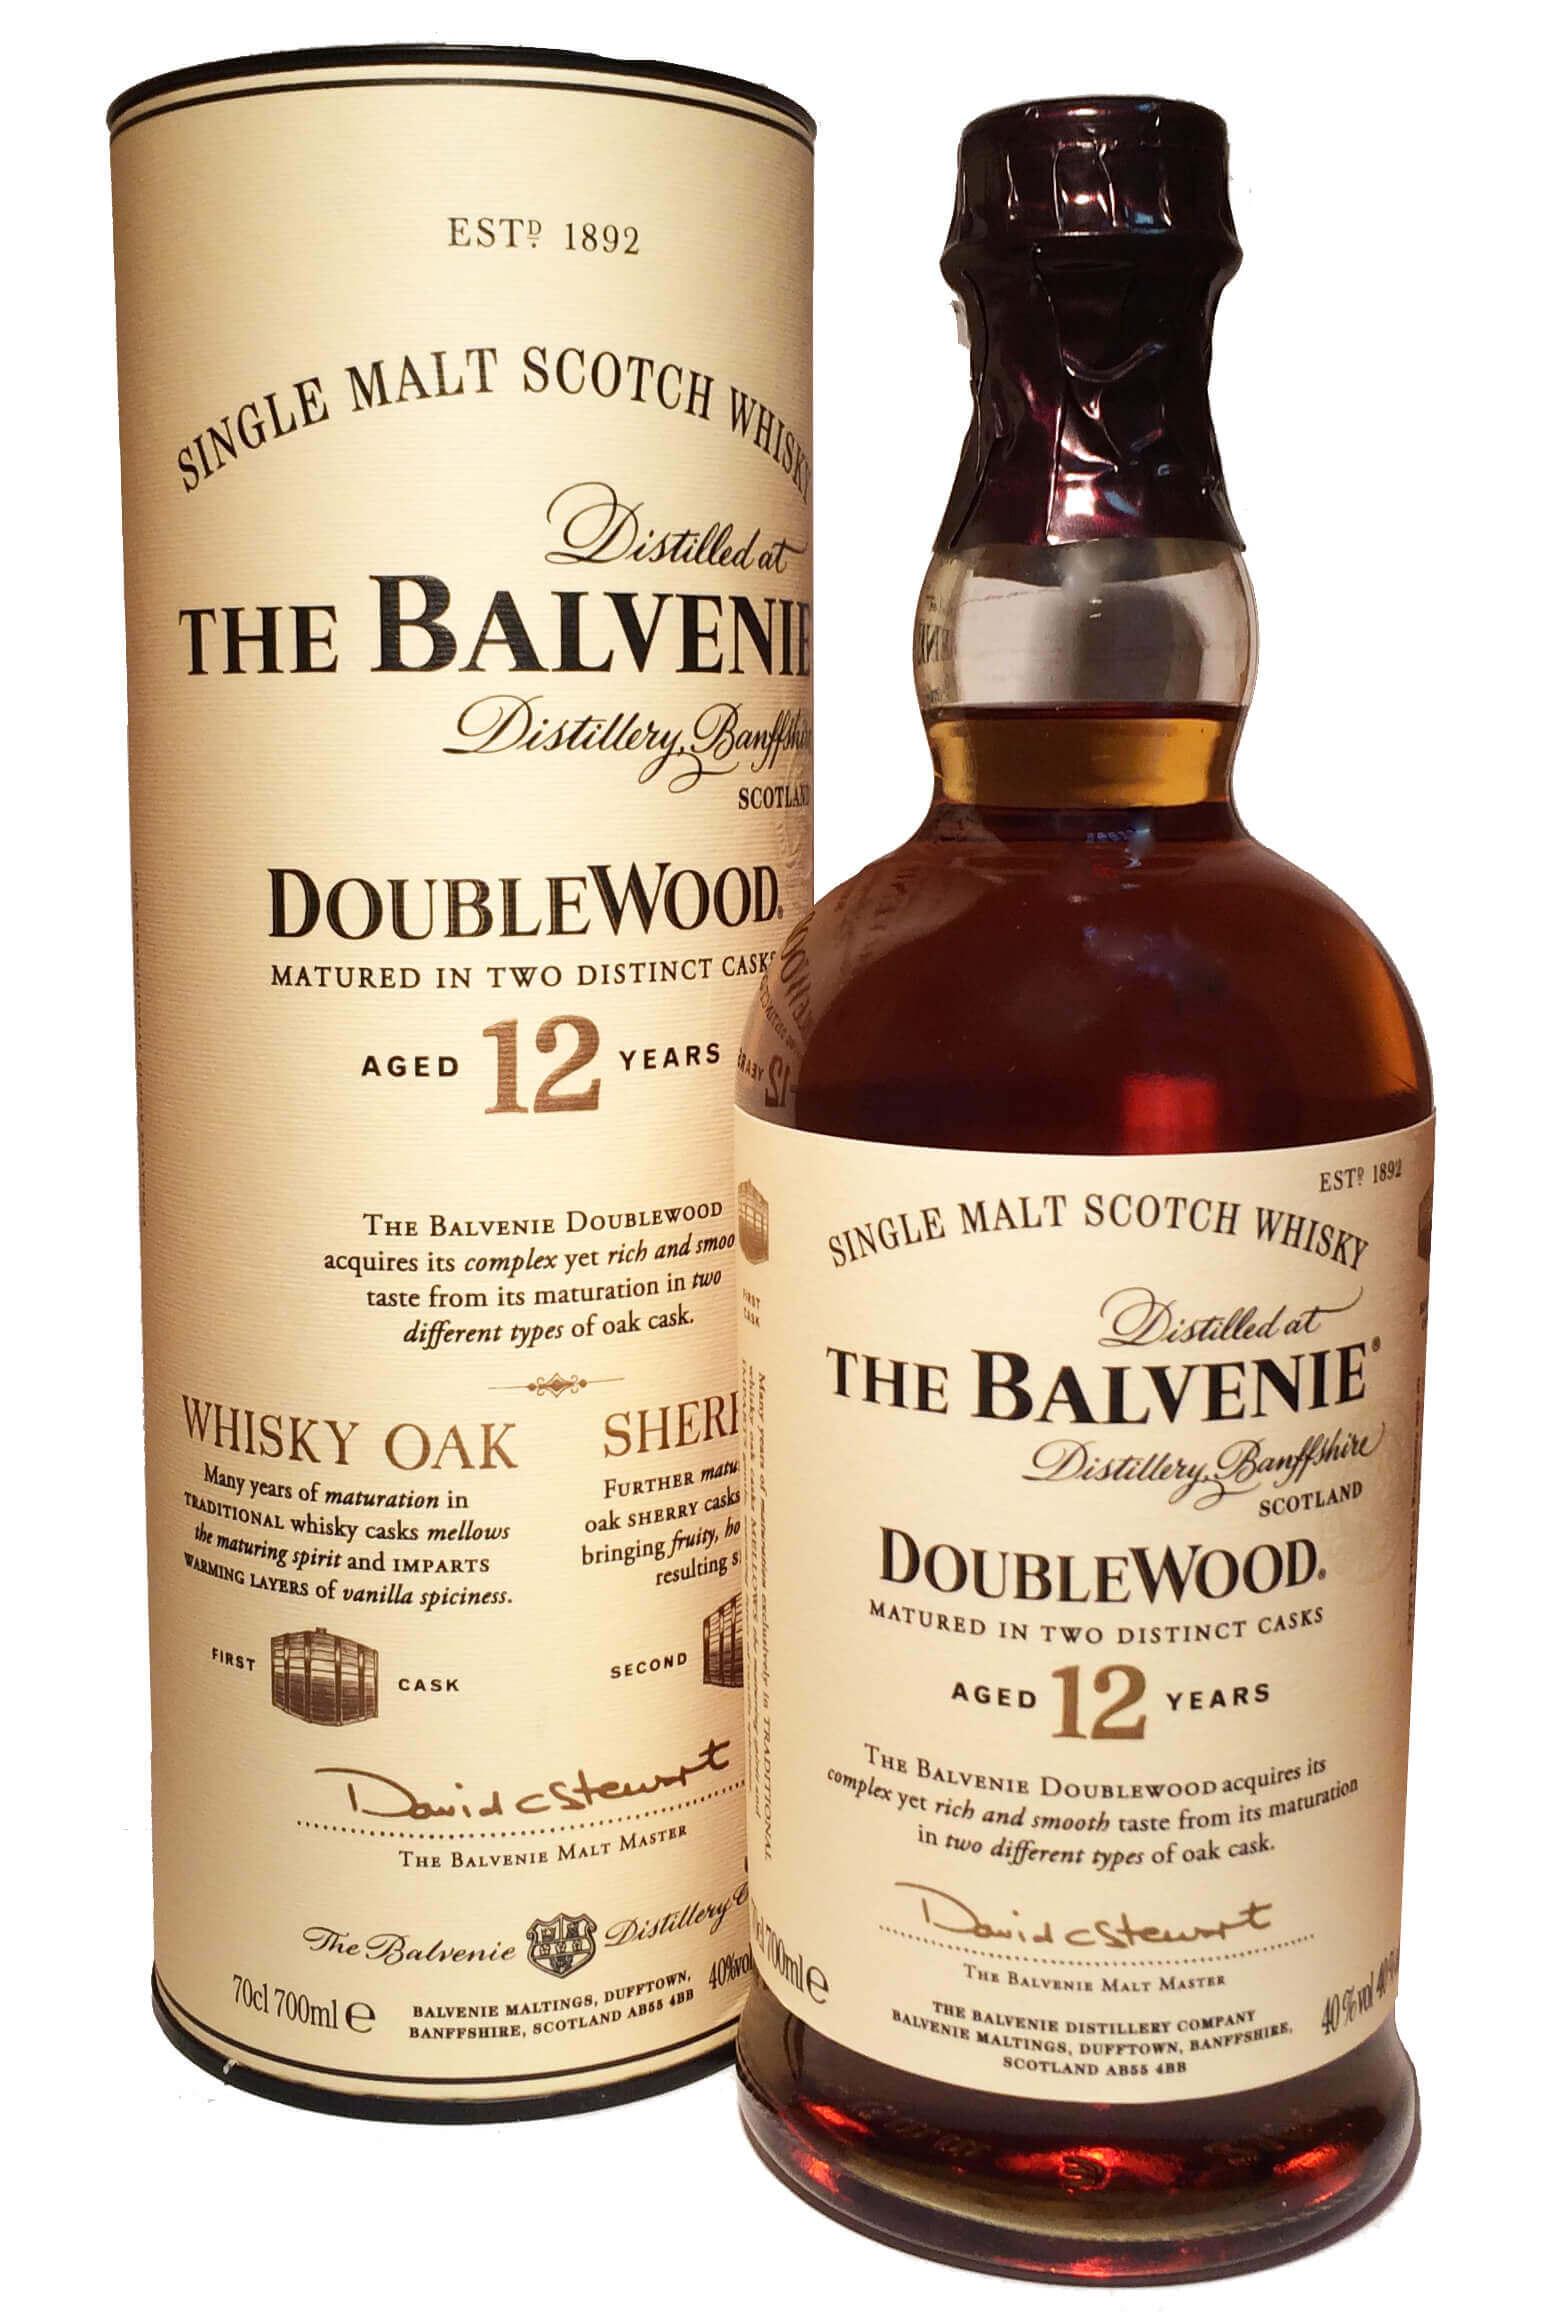 the balvenie doublewood single malt scotch whisky 12 jahre